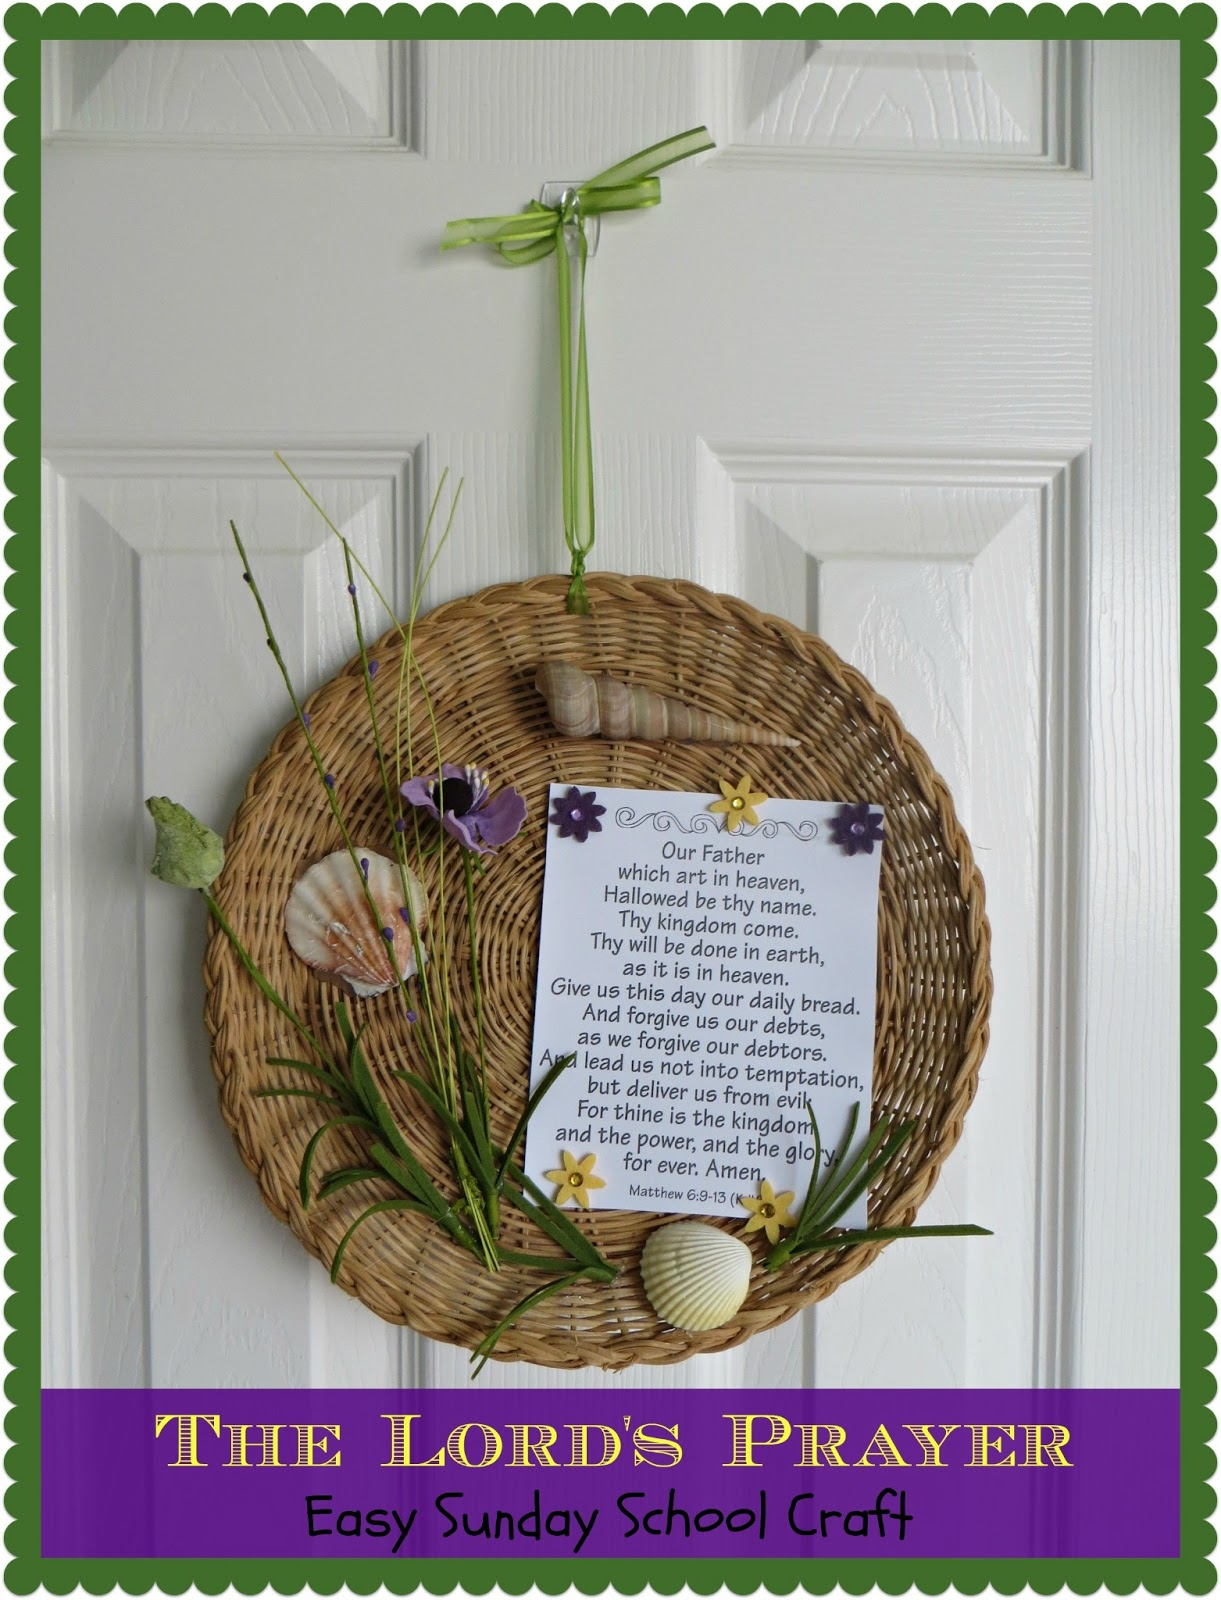 Crafty in Crosby: The Lord's Prayer - Easy Sunday School Craft